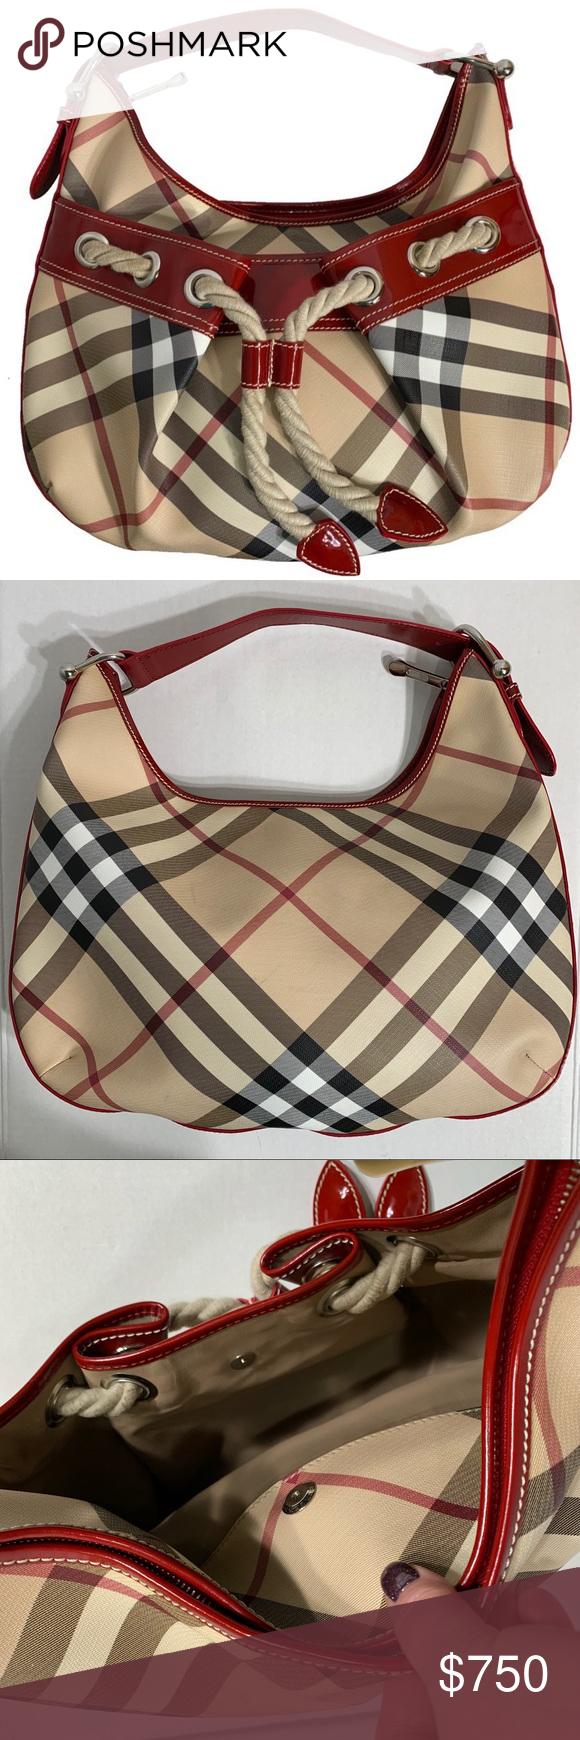 Burberry Large Nova Check Hobo Shoulder Bag Burberry Nova Check hobo style  shoulder bag. Red d274d21a90